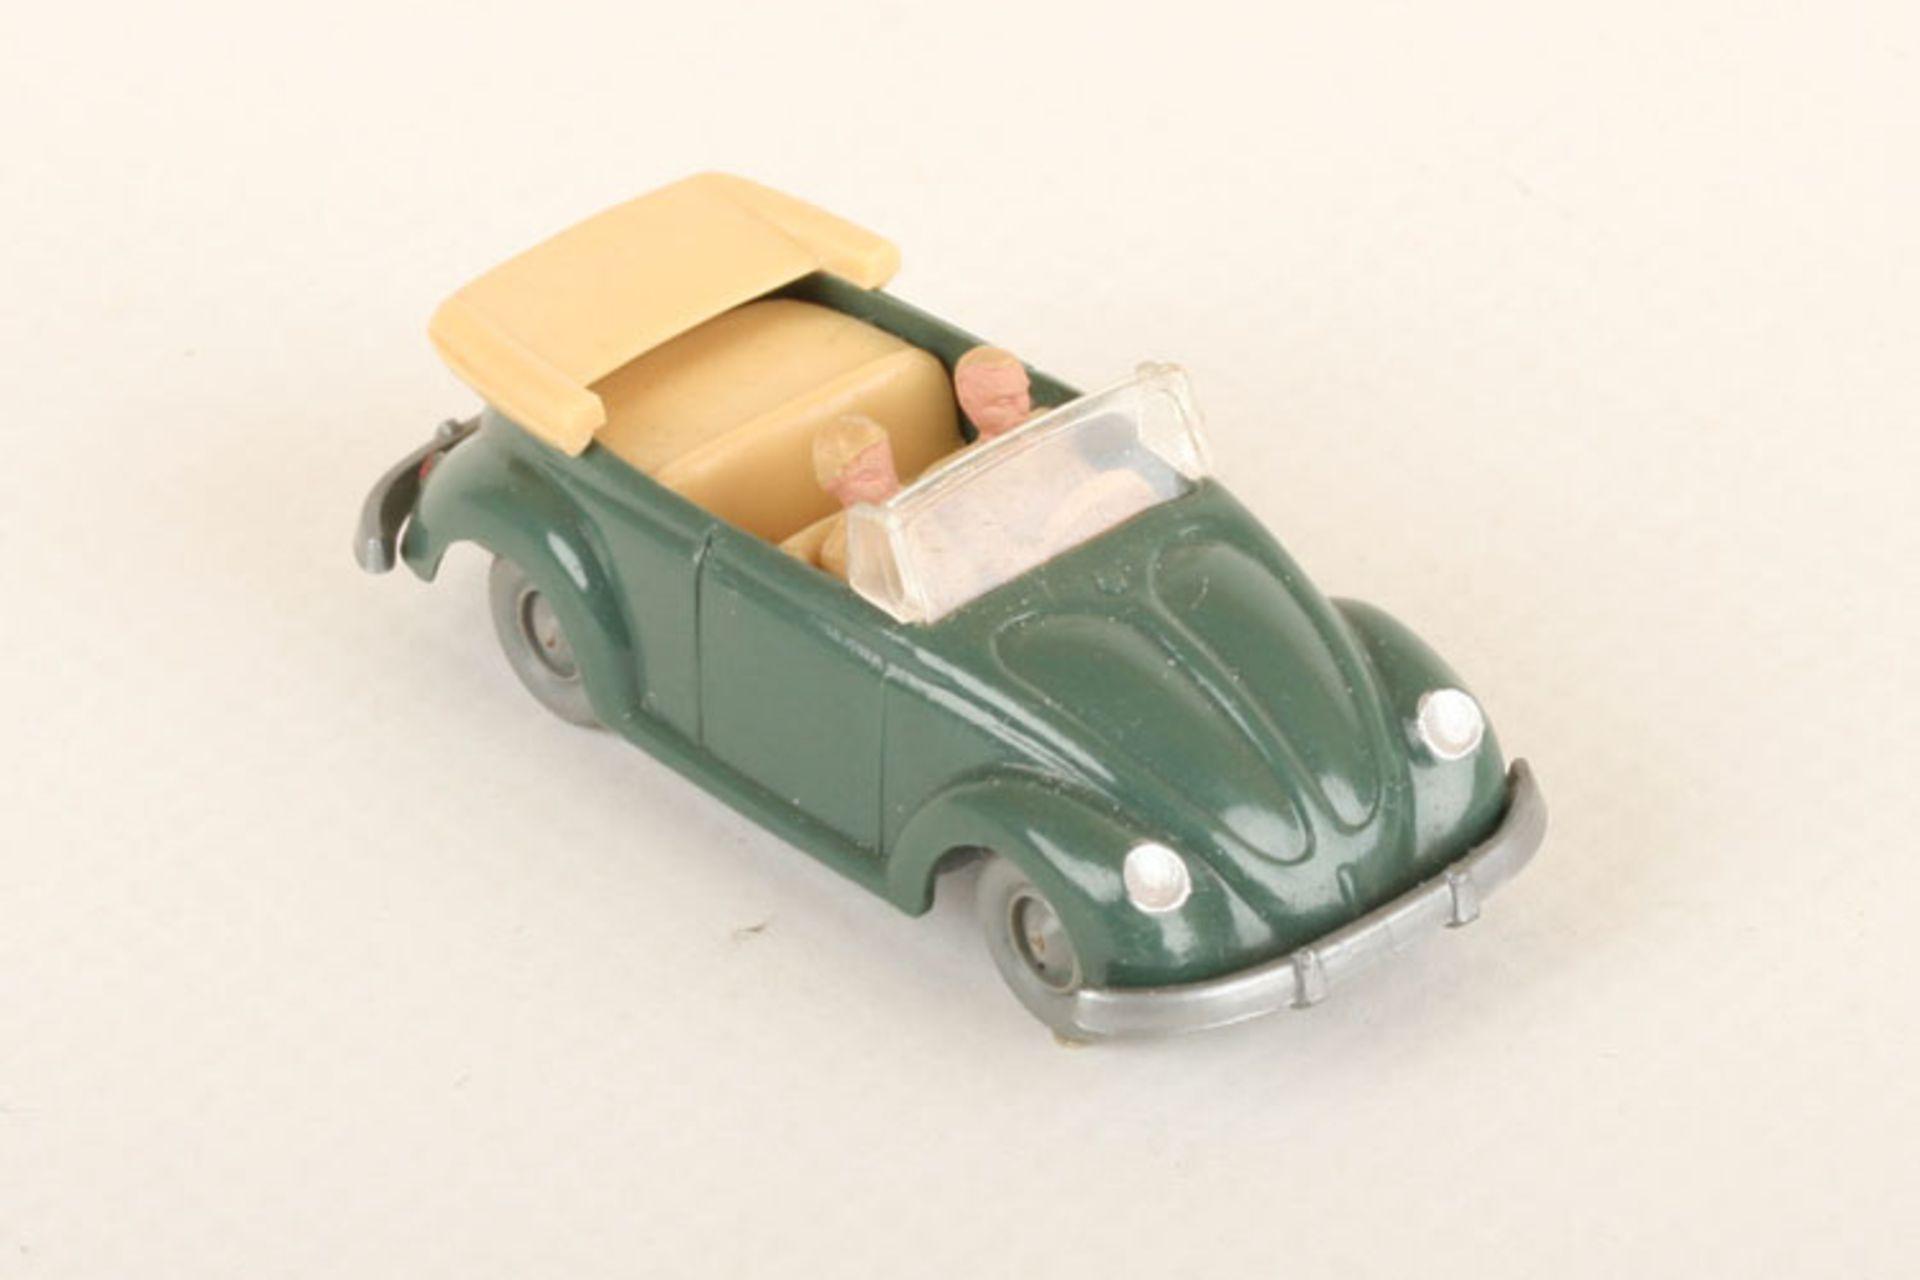 Los 1016 - Wiking VW Käfer Cabrio h'patinagrün 33/6x, IE h'beige, neuwertig